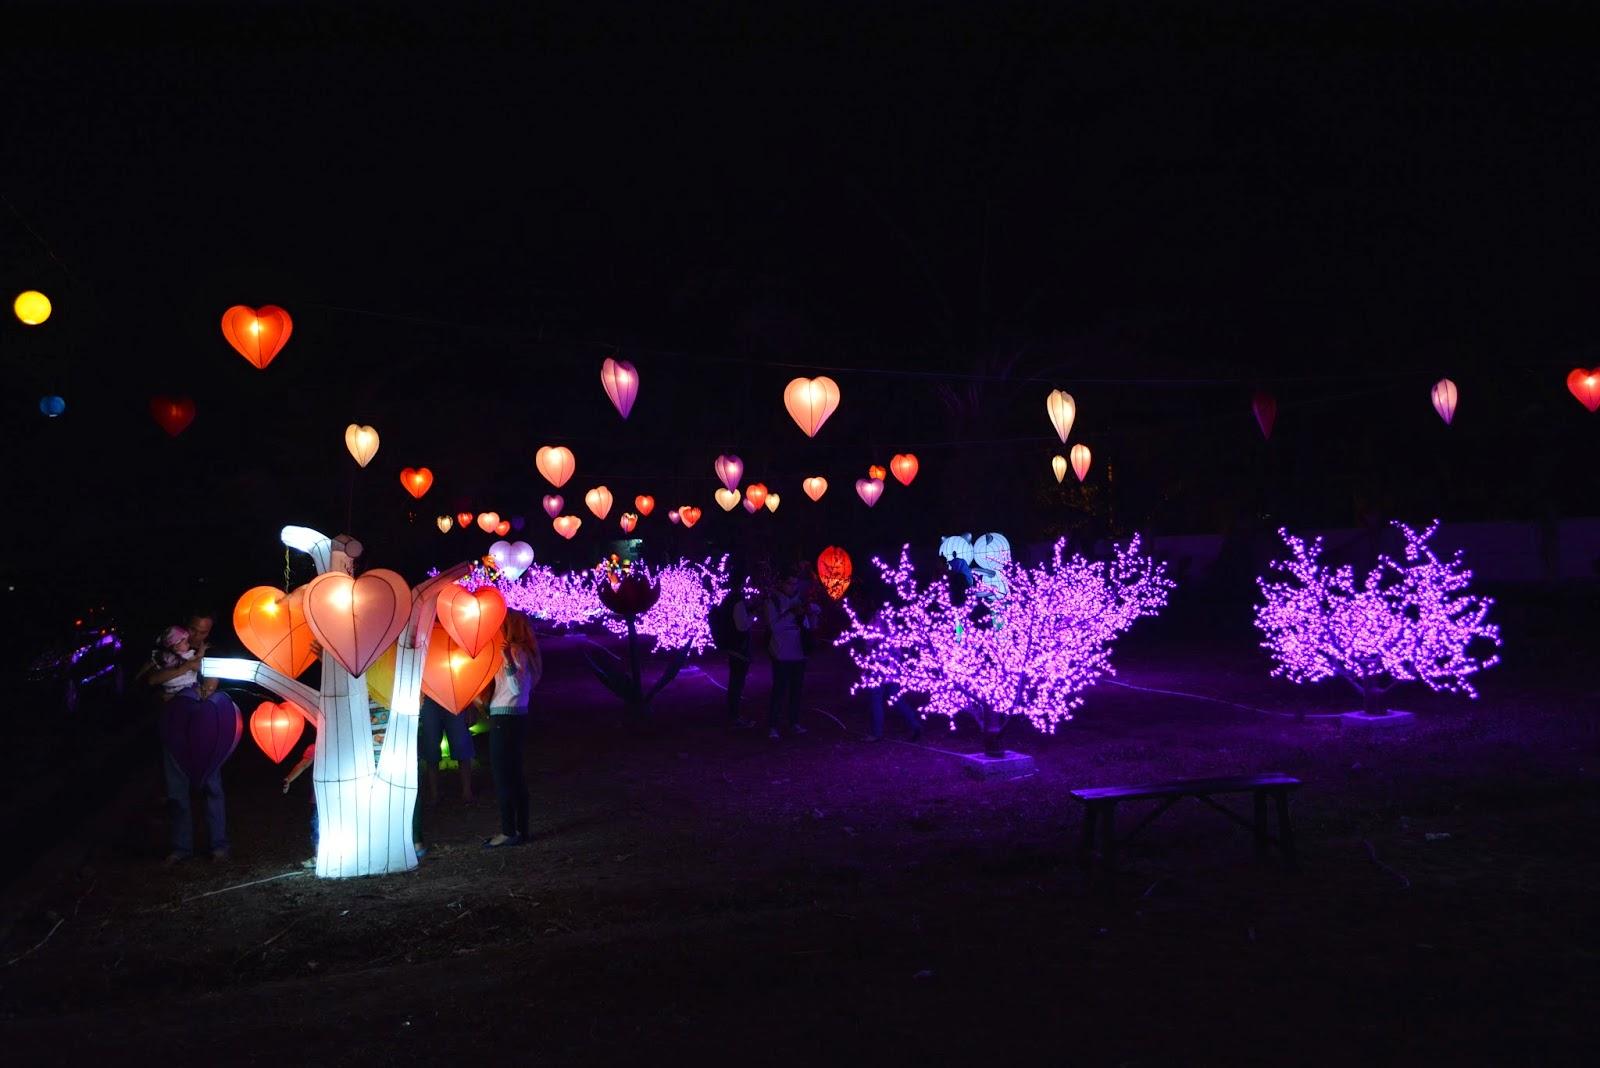 Taman Pelangi Sriwijaya Romantic Garden Palembang Kota